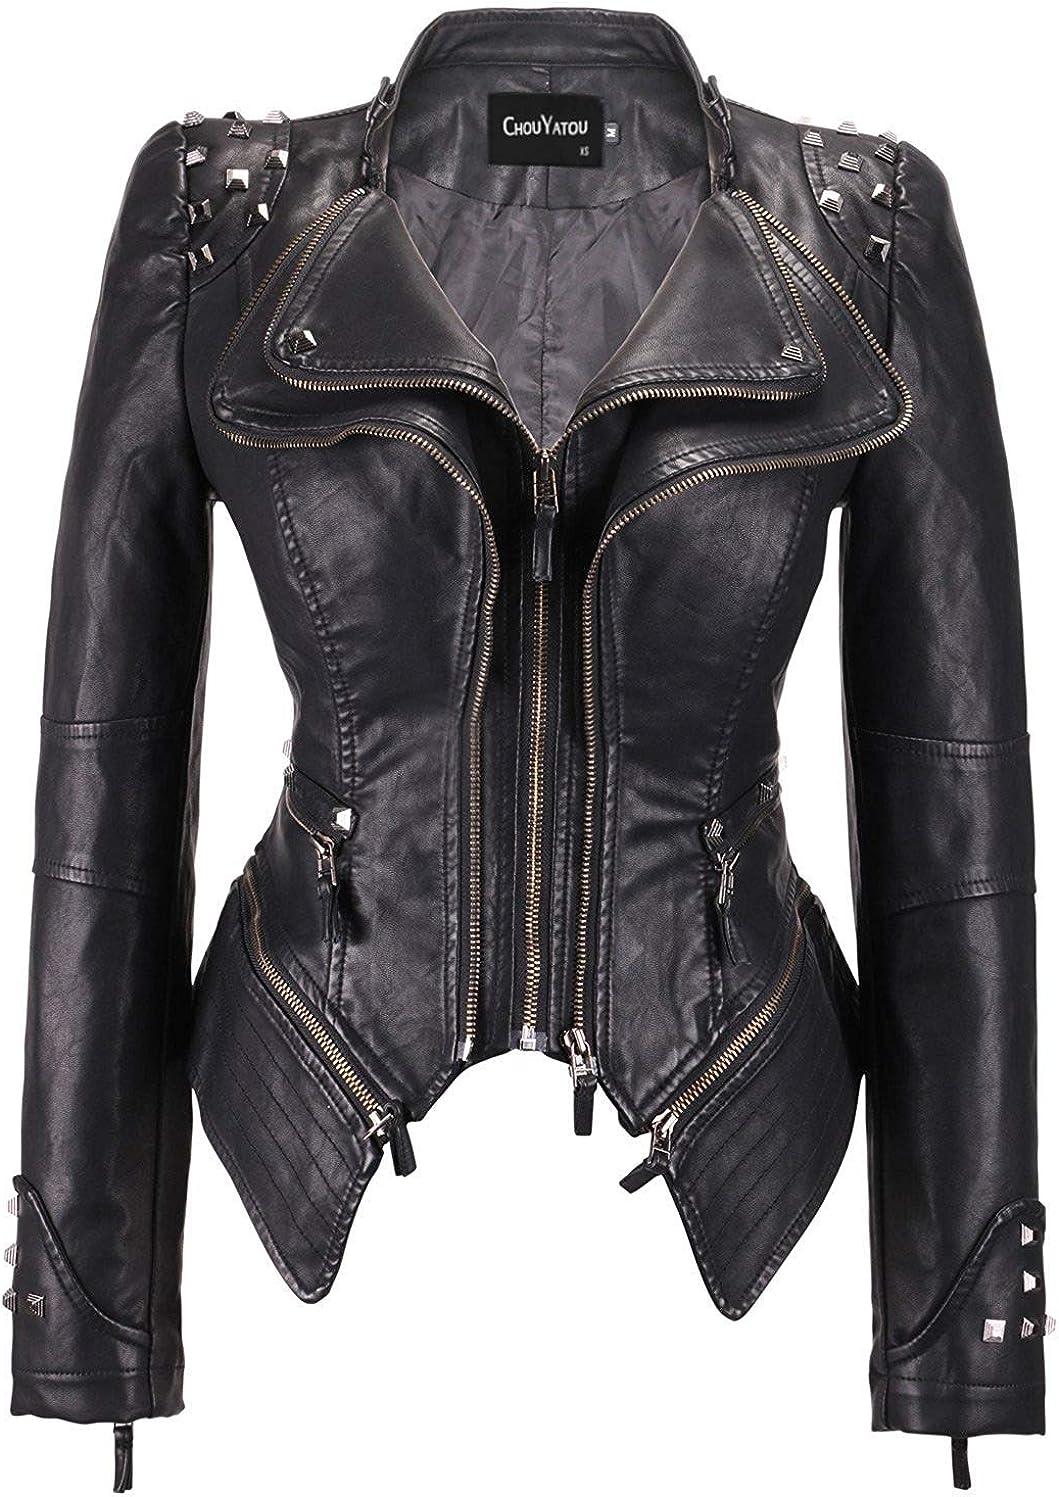 chouyatou Women's Fashion Studded Perfectly Shaping Faux Leather Biker  Jacket at Amazon Women's Coats Shop